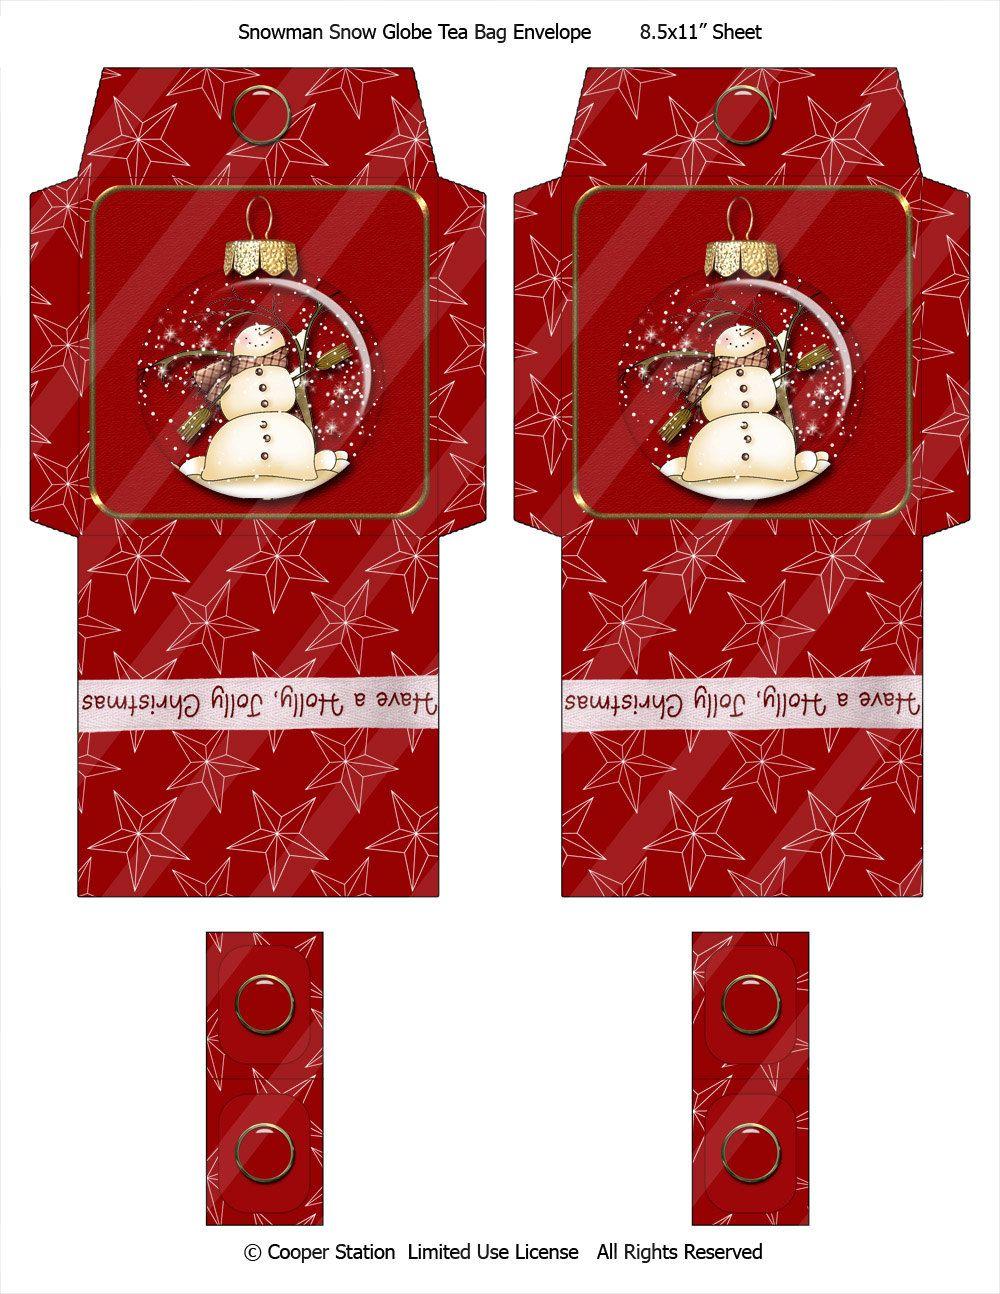 Digital tea bag envelope snowman theme by cooperstation on etsy